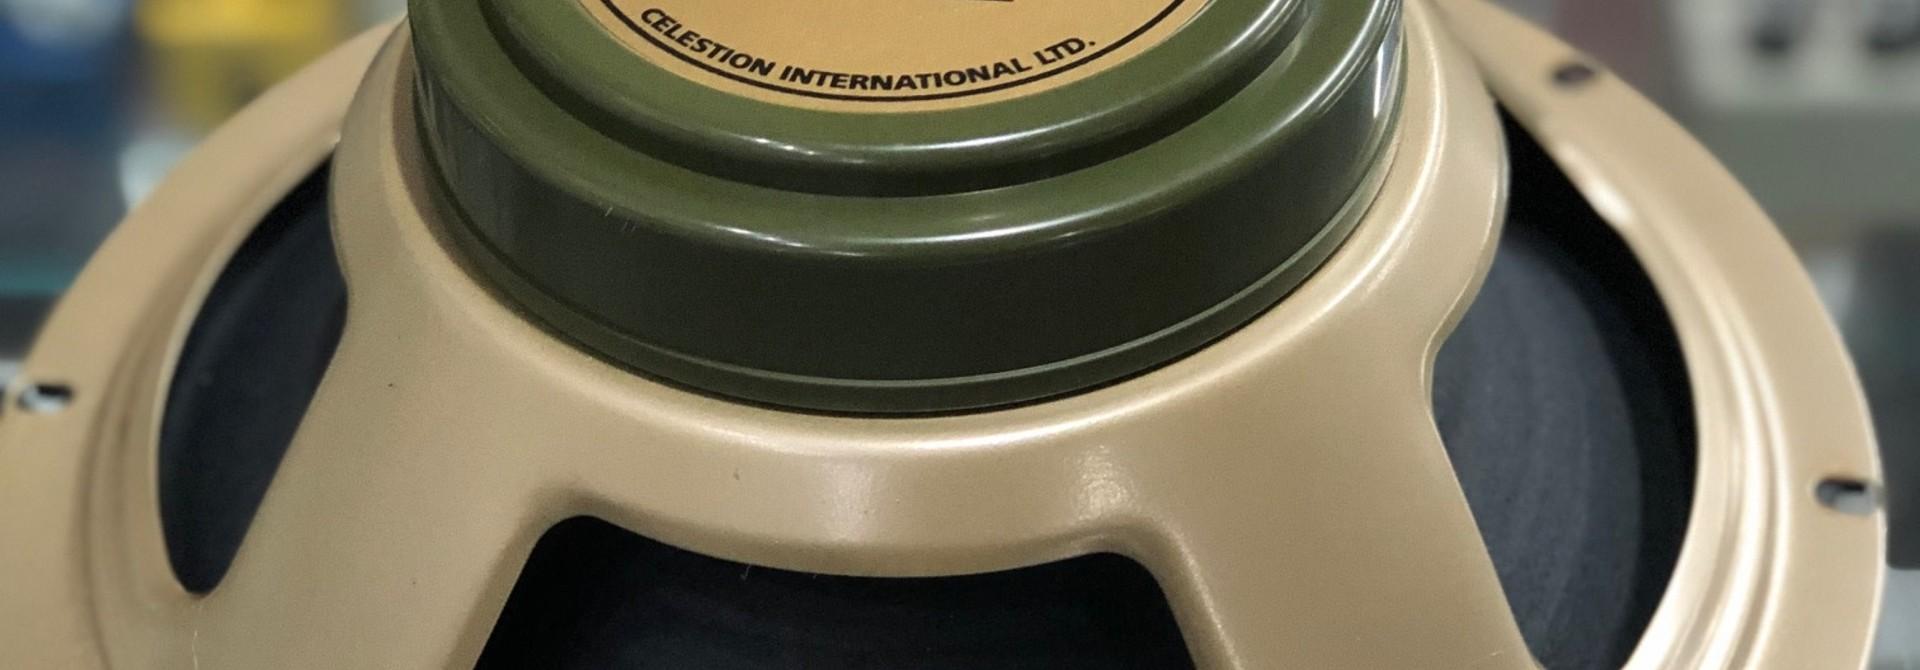 Celestion G10 Greenback 30 w